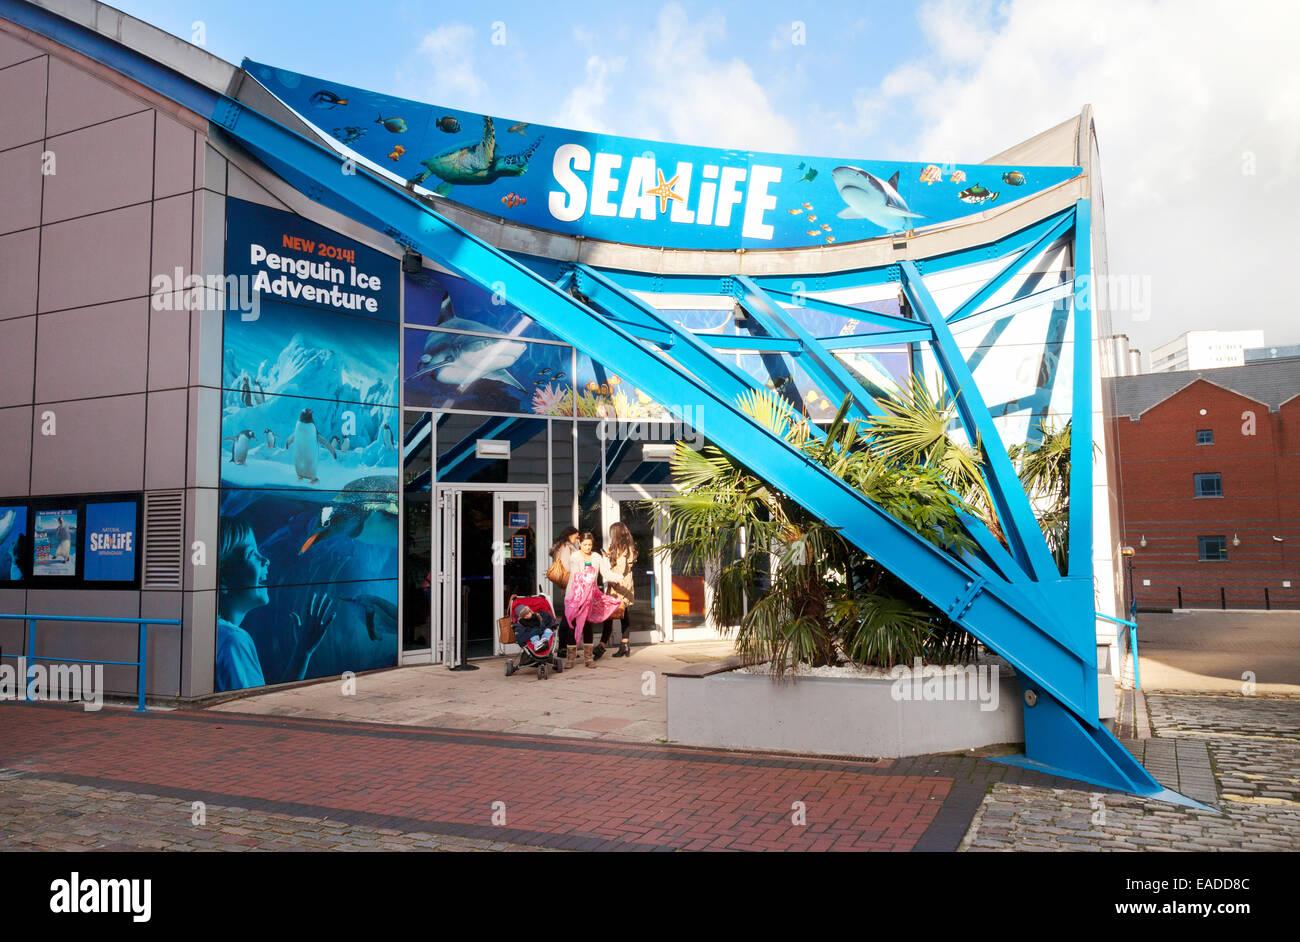 Entrance to the National Sealife Centre, Birmingham UK - Stock Image